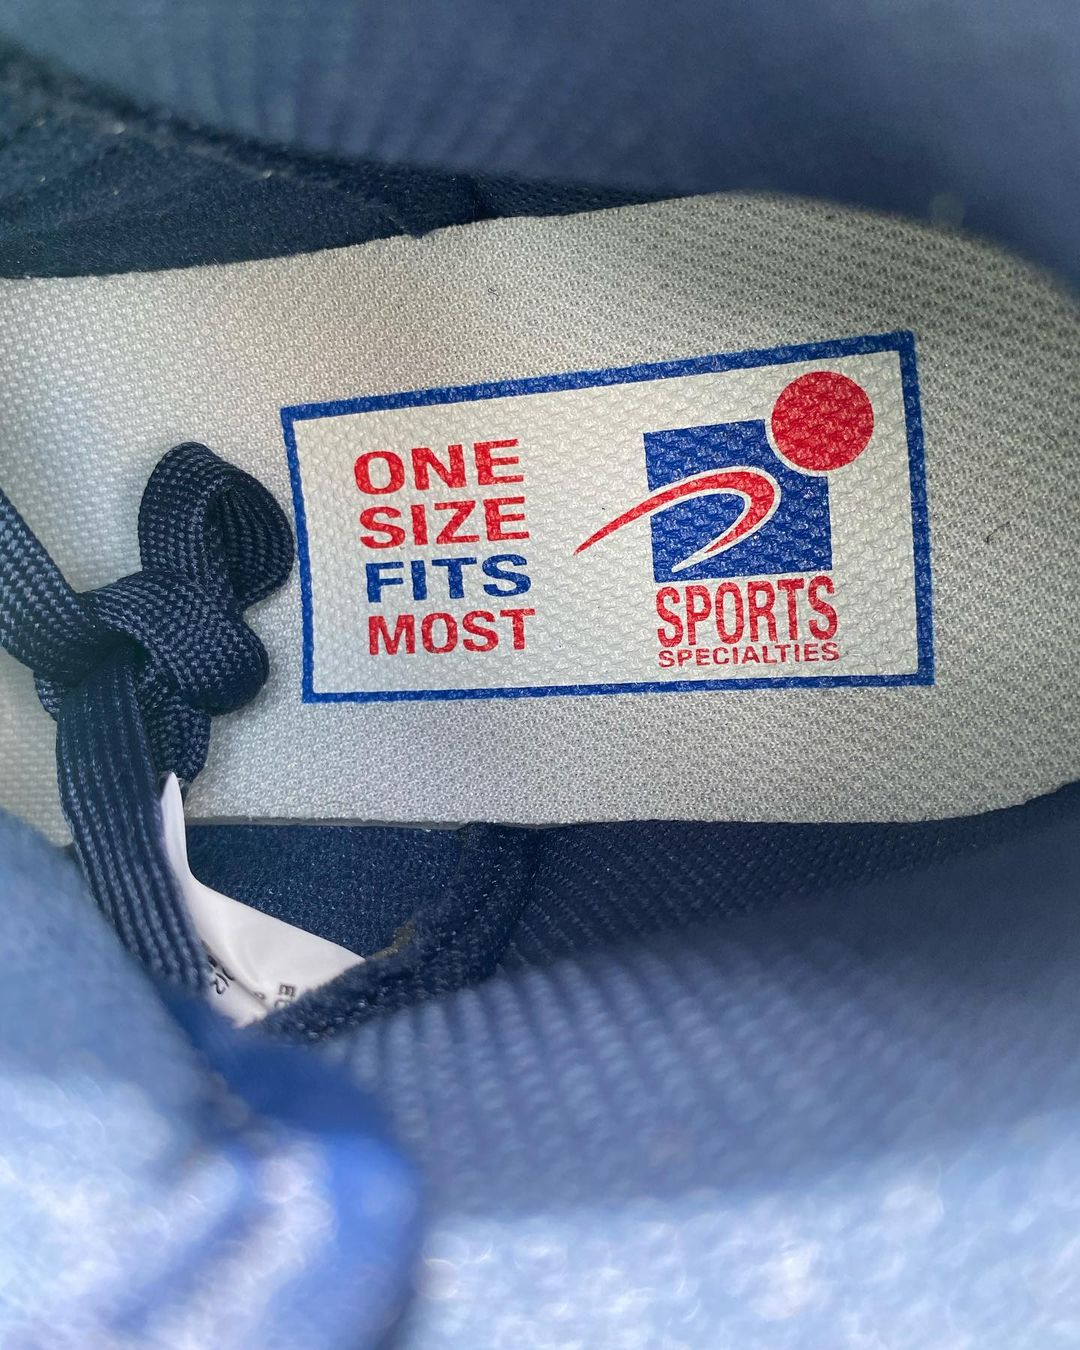 Nike Dunk High Sports Specialties Nike Dunk High Sports Specialties DH0953-400 Release Date Info